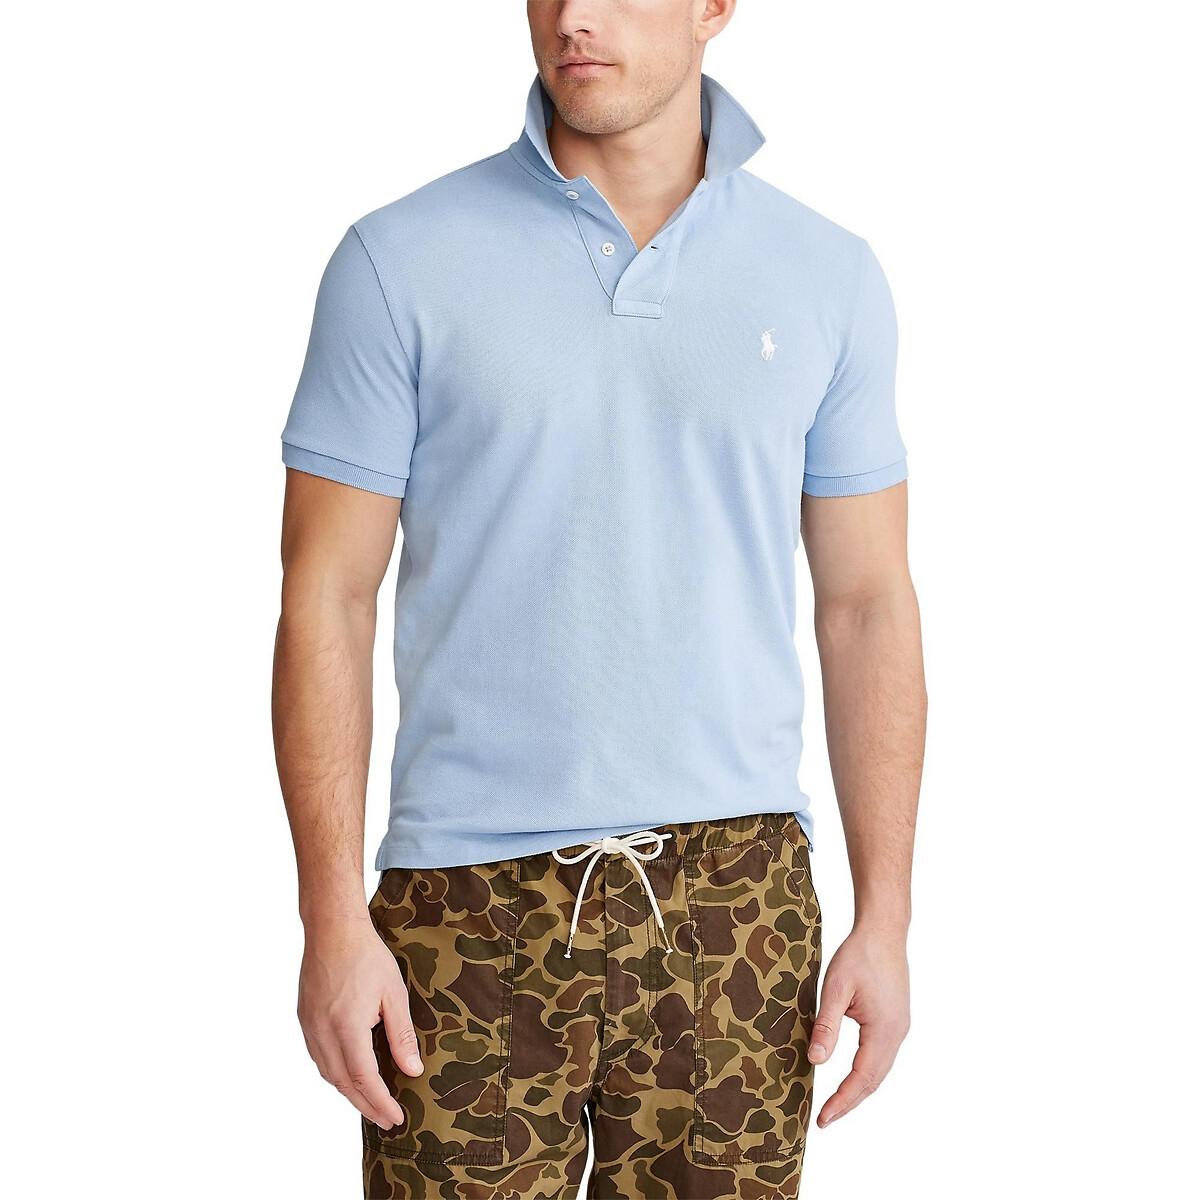 Поло LaRedoute Прямой покрой Custom Fit из трикотажа пике L синий футболка поло la redoute из трикотажа пике shaker xxl синий